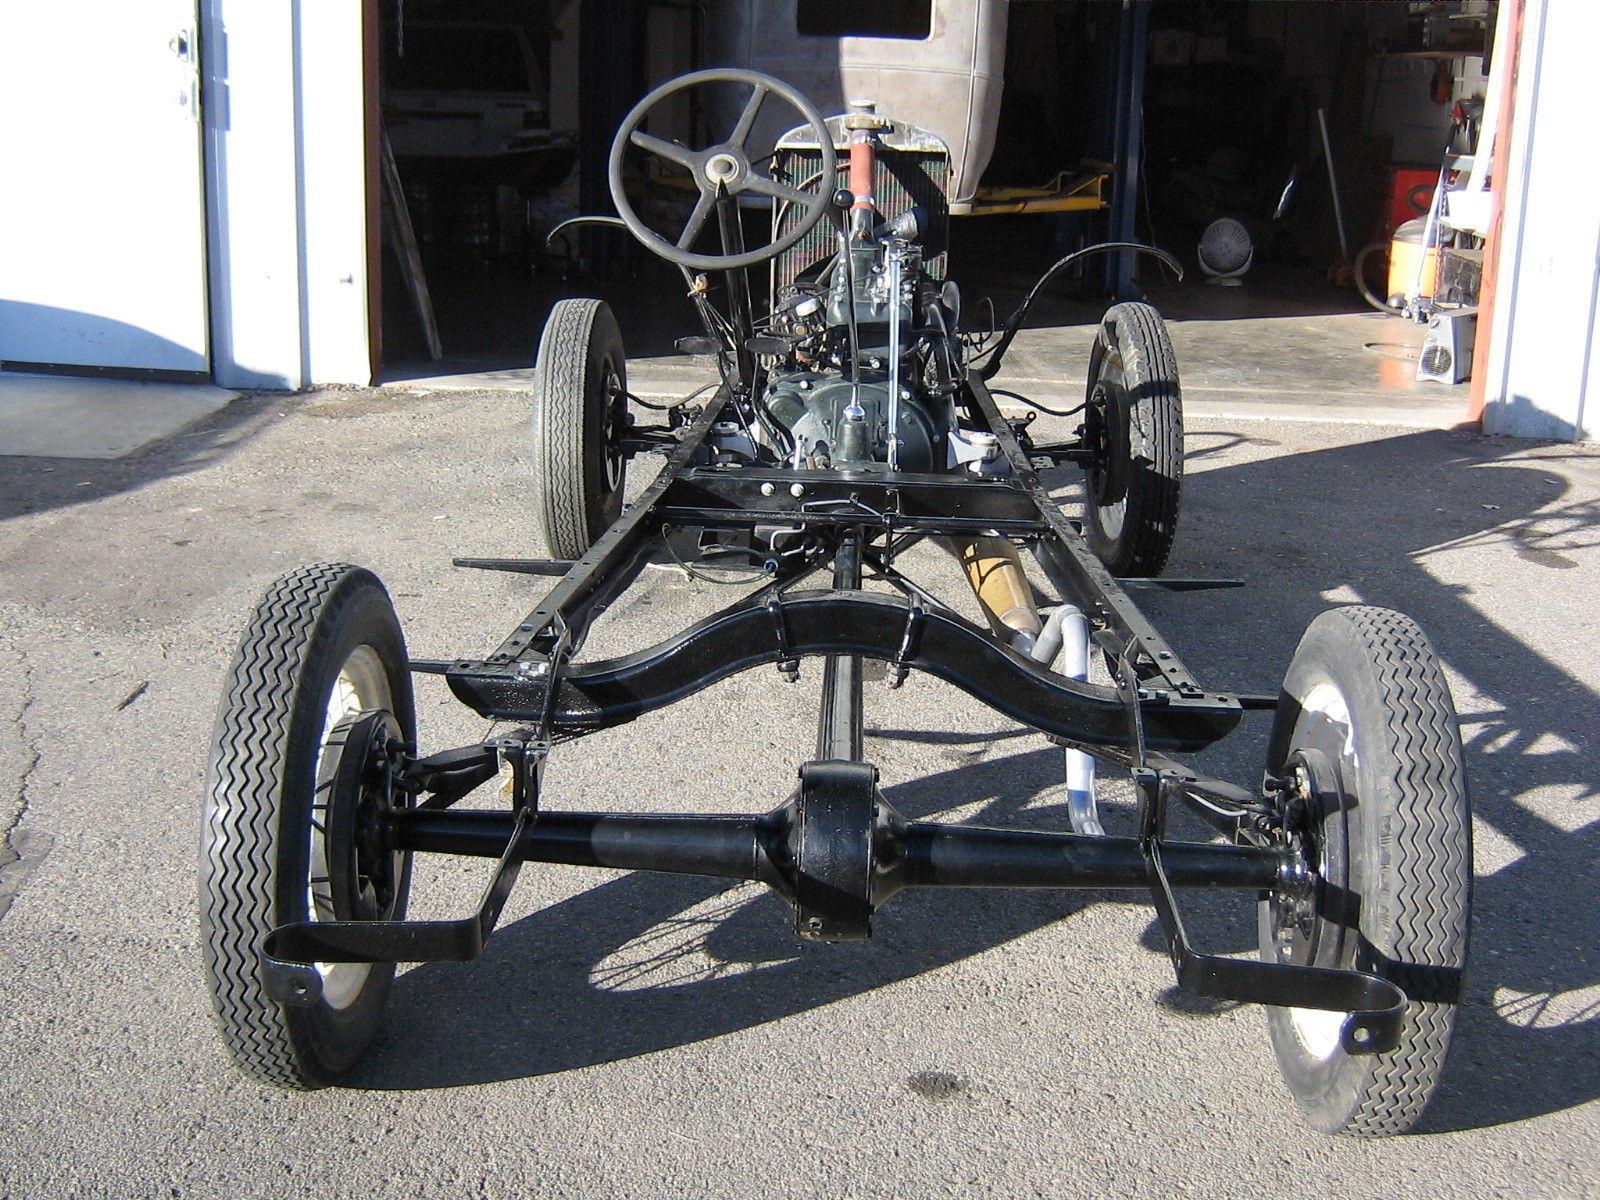 1930 1931 30 31 ford model a chassis stock rebuilt juice. Black Bedroom Furniture Sets. Home Design Ideas